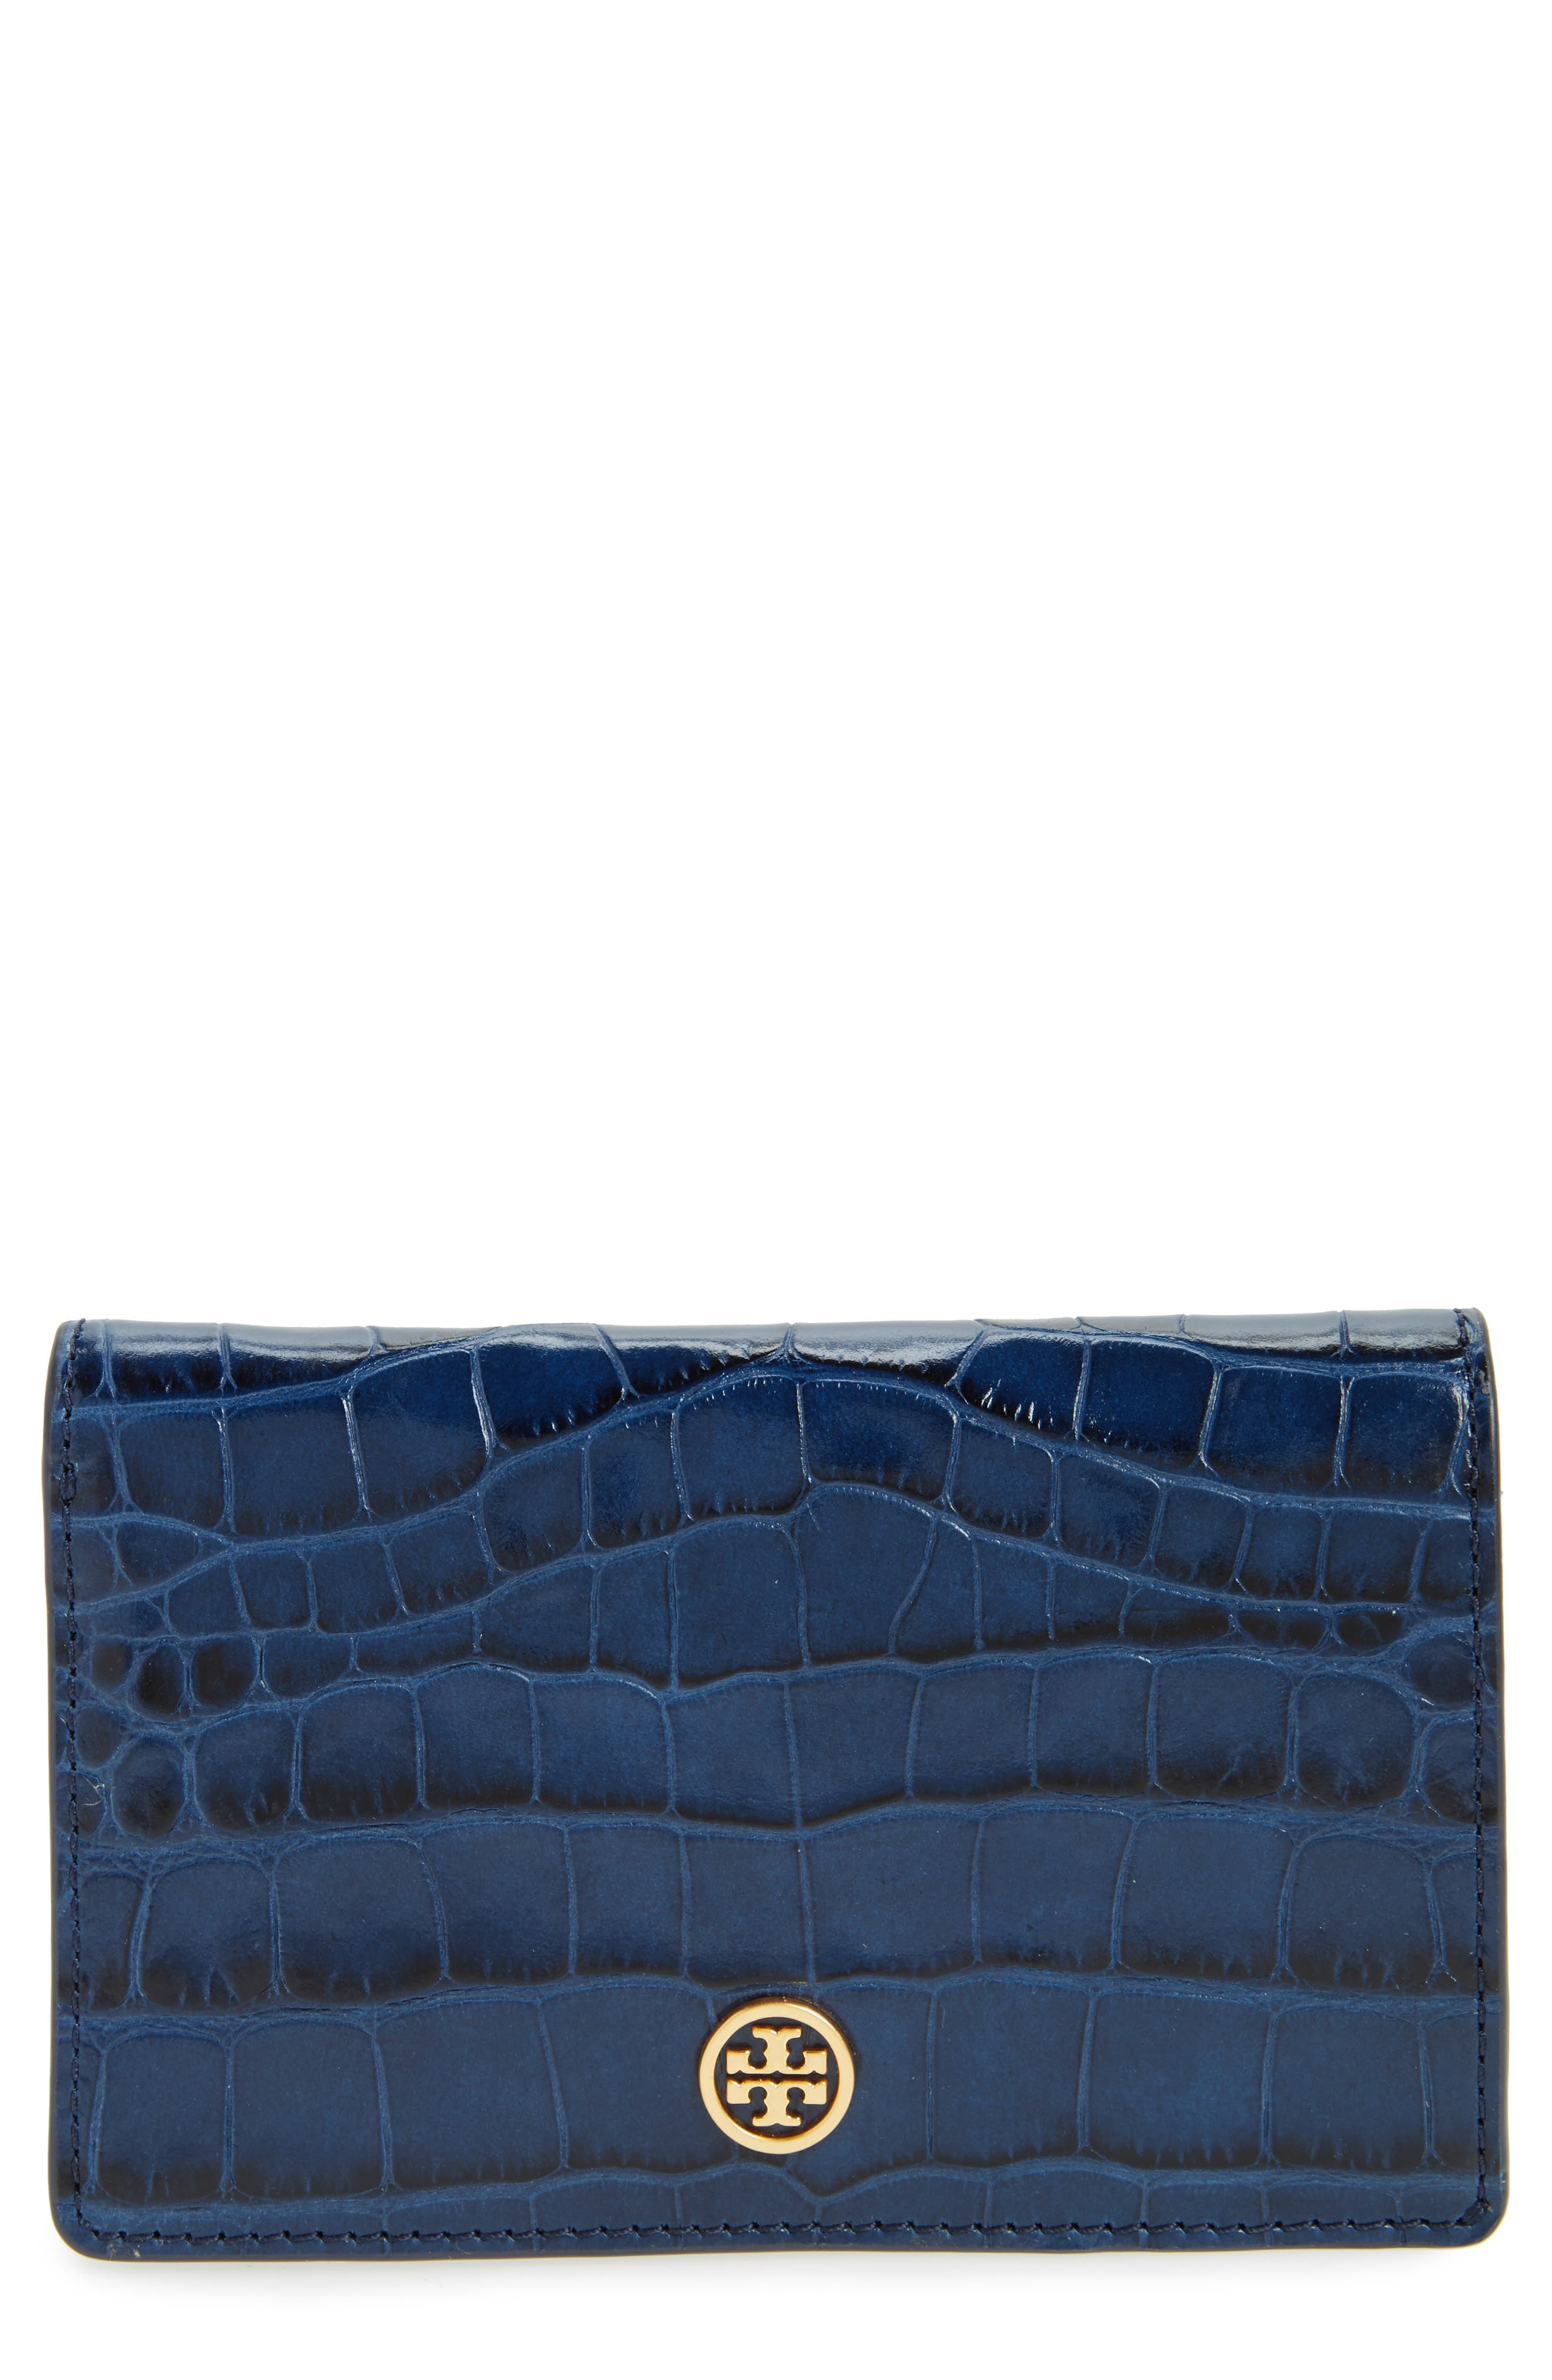 Parker Slim Croc Embossed Leather Wallet,                         Main,                         color, Tory Navy Croc